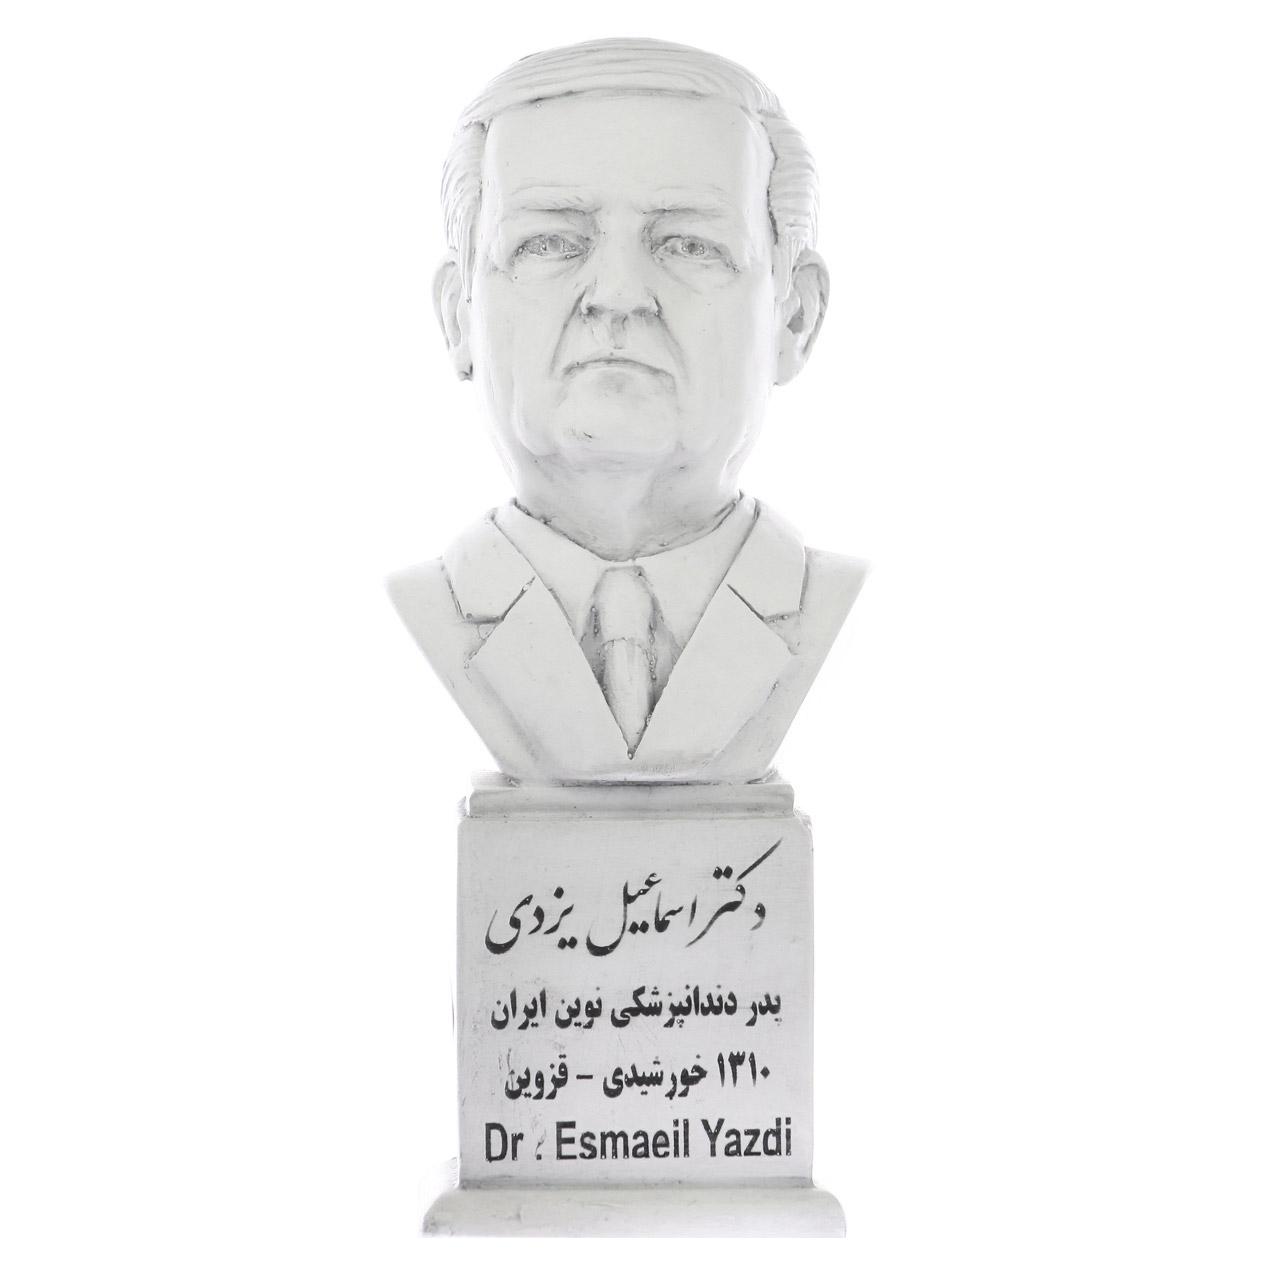 dr esmaeil yazdi s - دکتر اسماعیل یزدی پدر دندانپزشکی نوین ایران